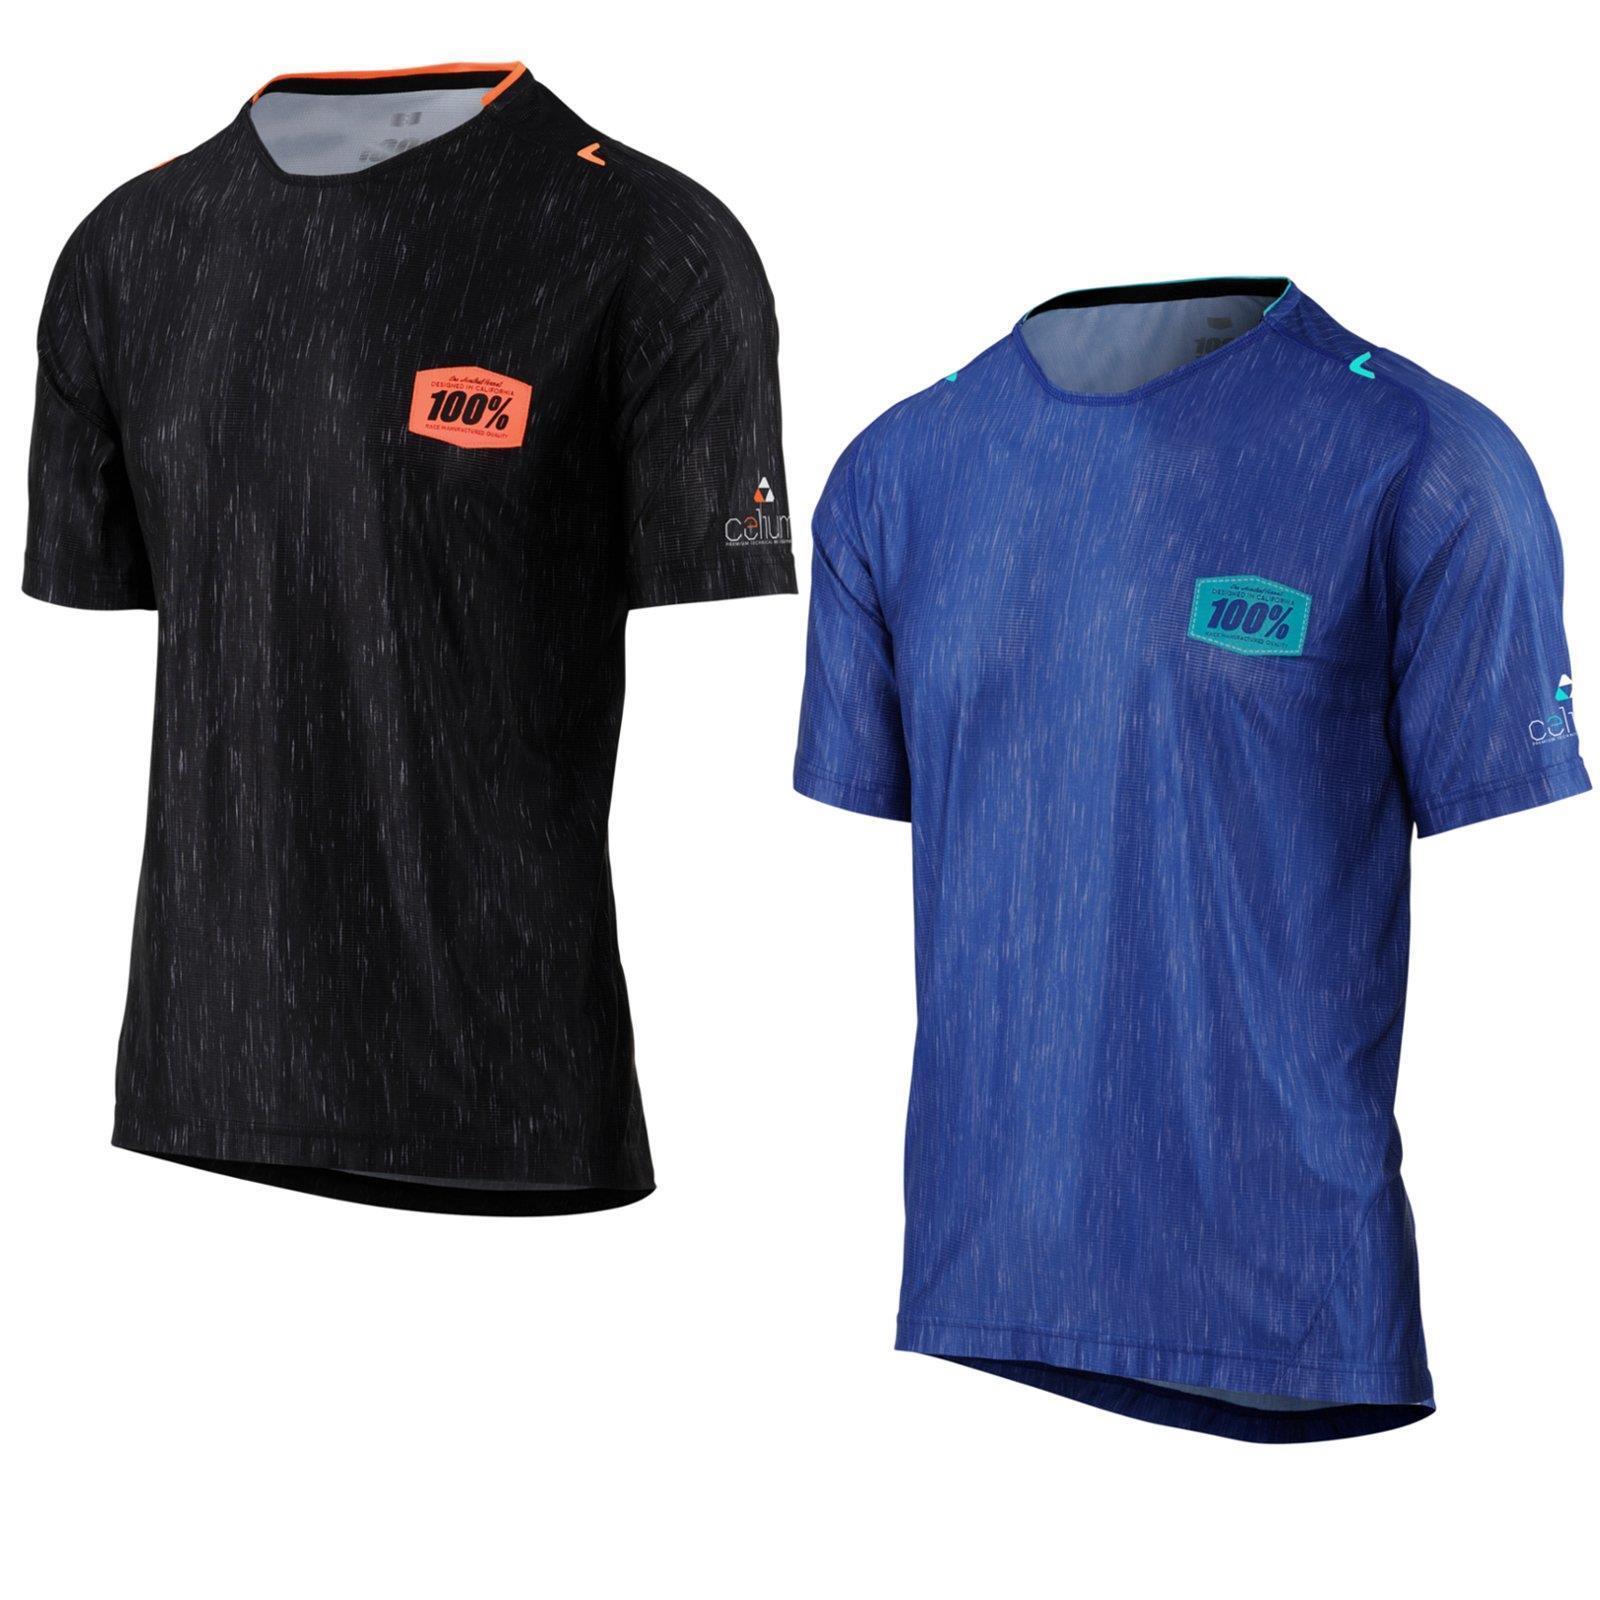 100% Prozent Celium Jersey Shirt Trikot Enduro Trail Mountain Bike MTB Kurzarm